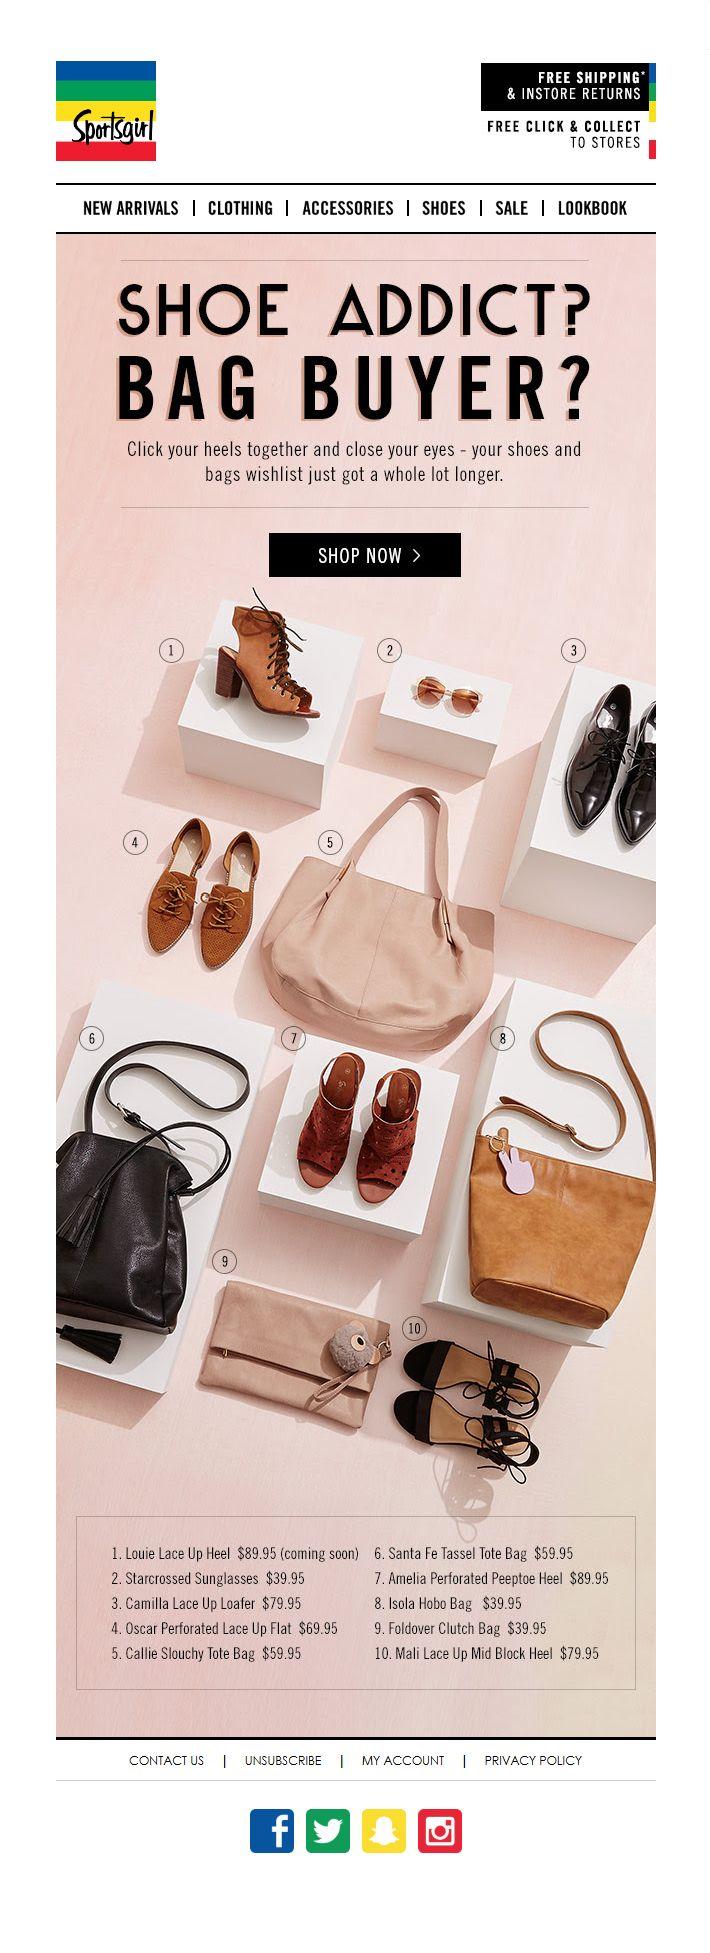 #web #website #weblayout #email #newsletter #shoes #bags #fw16 #brown #black